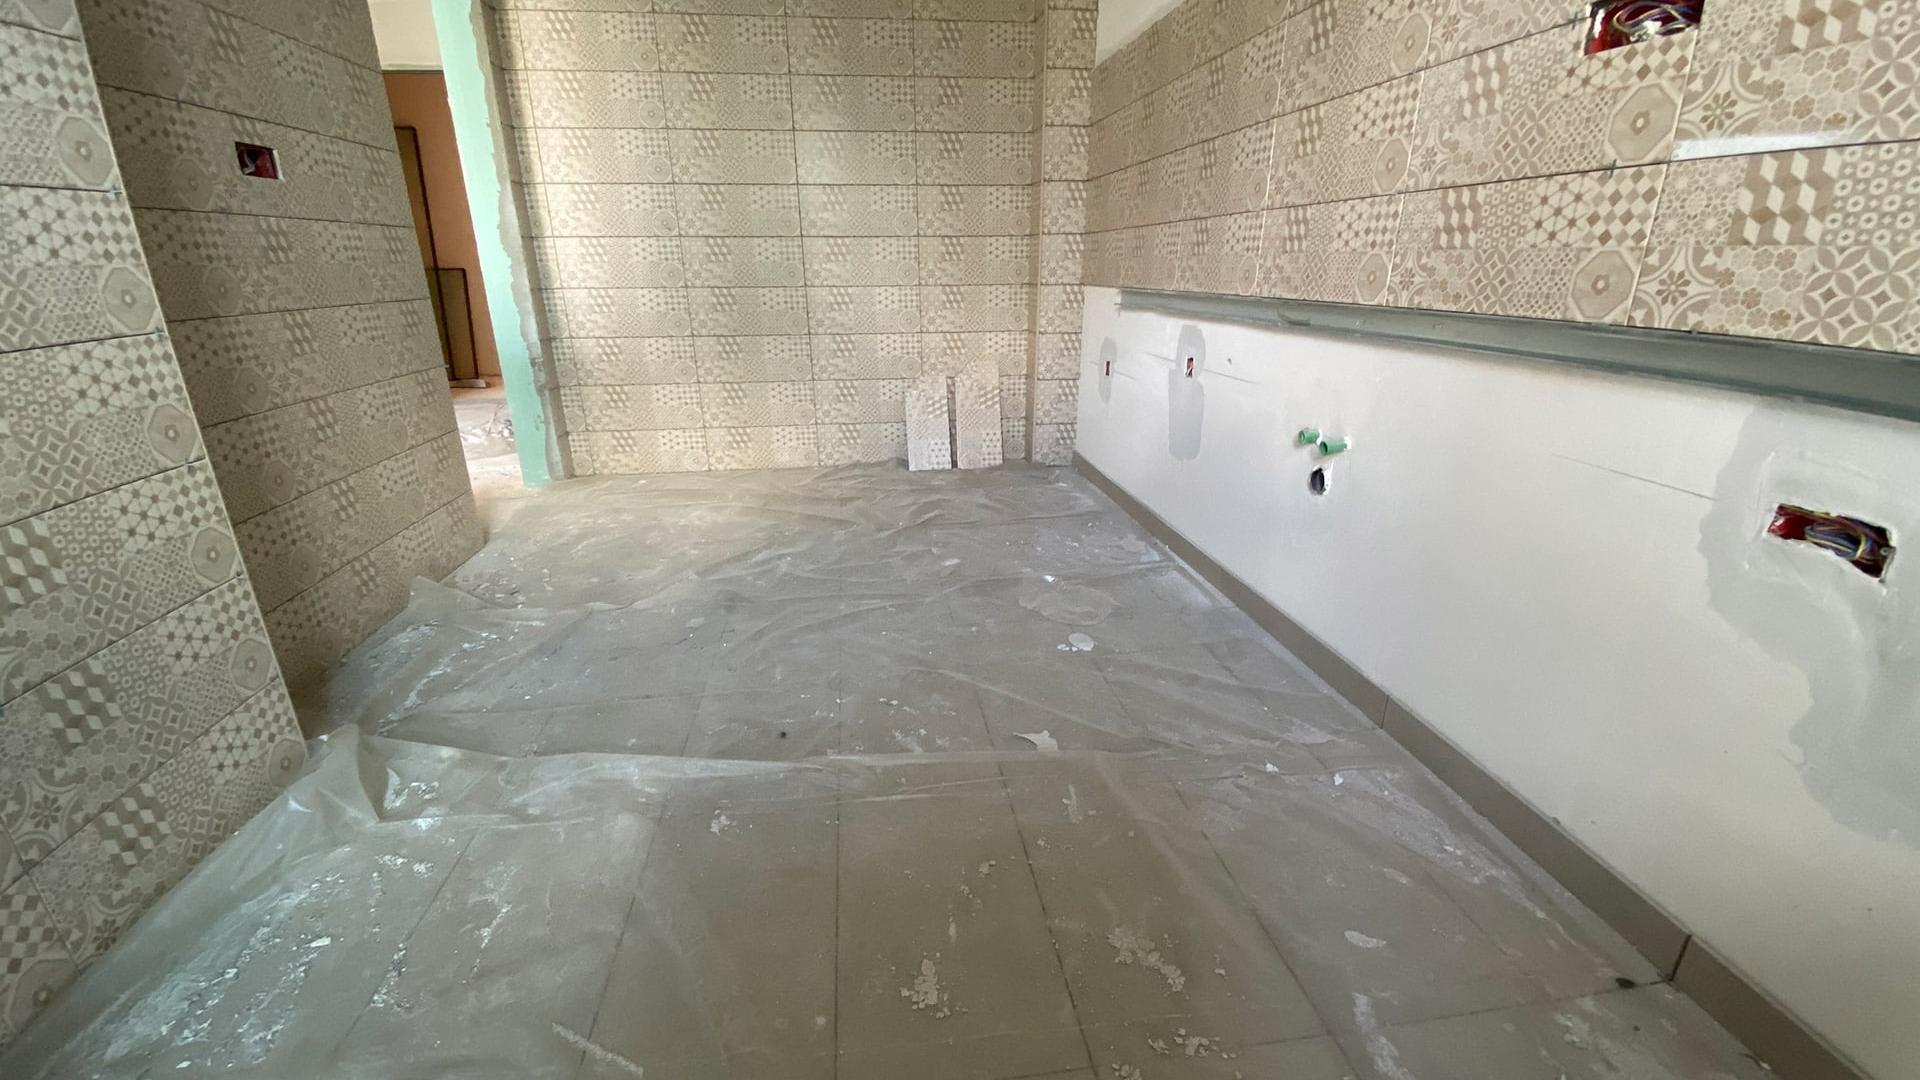 Stadiu executie Uverturii Residence 30 Aprilie 2020 - Apartamente si garsoniere de vanzare Militari, Gorjului - 5